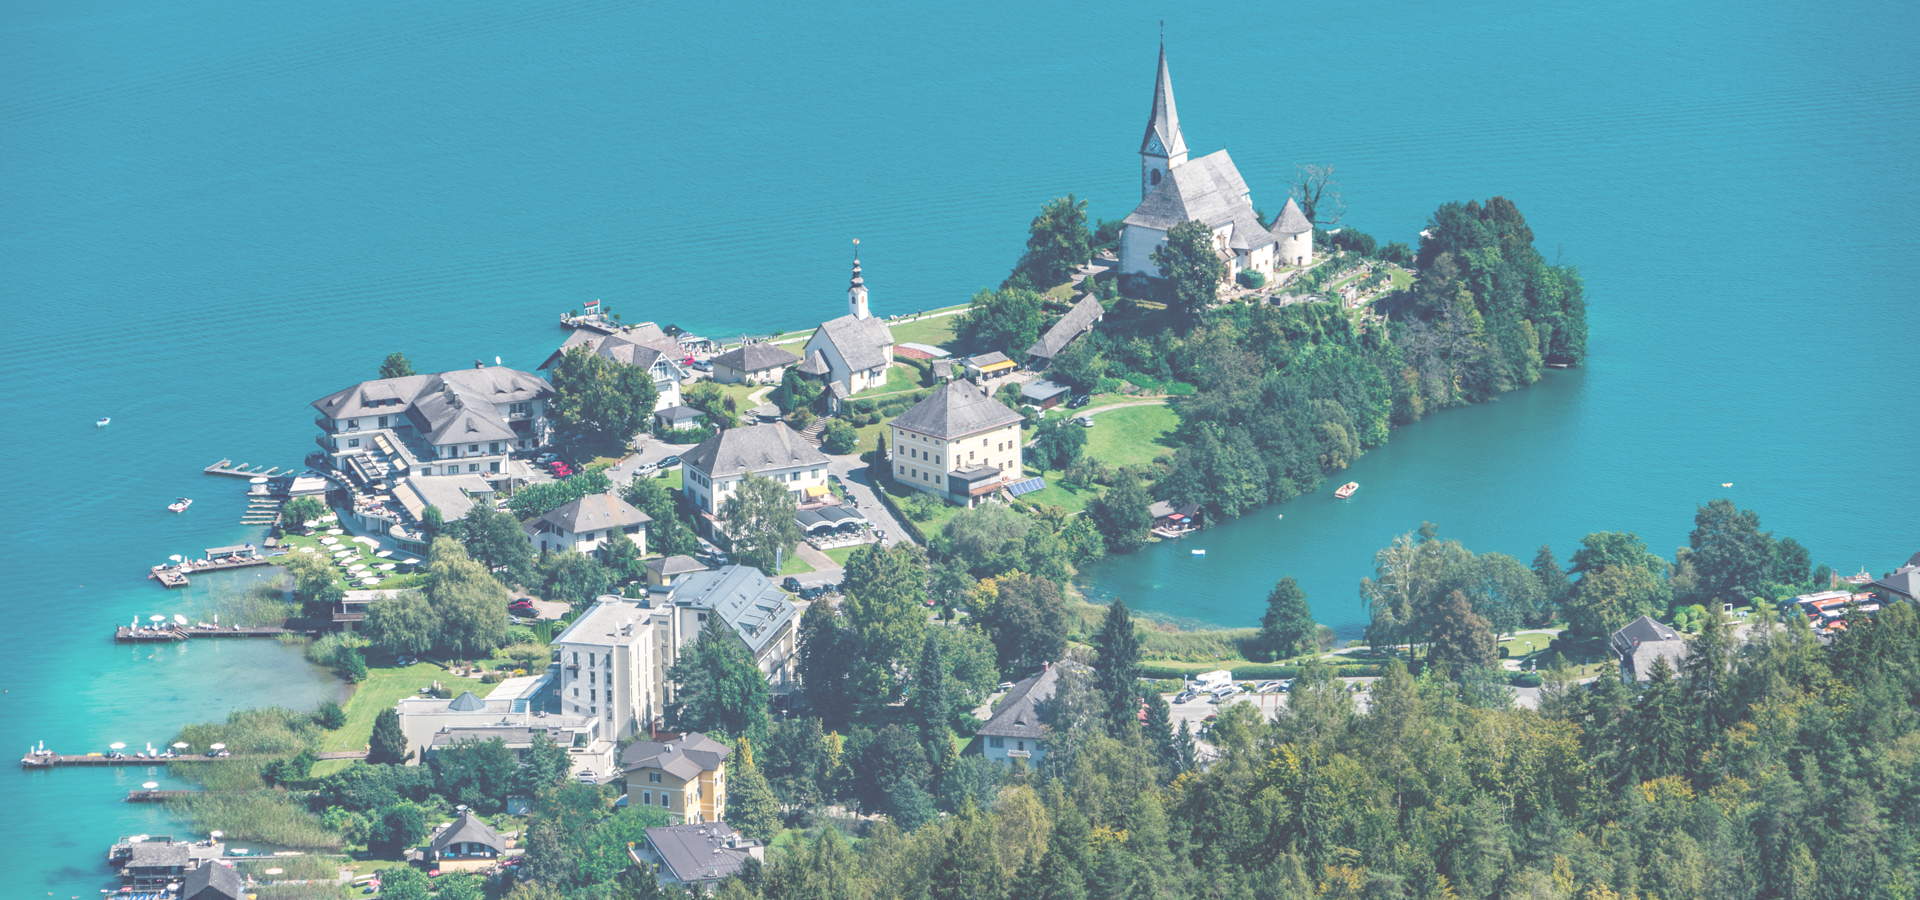 Peer-to-peer advisory in Klagenfurt, Carinthia, Austria